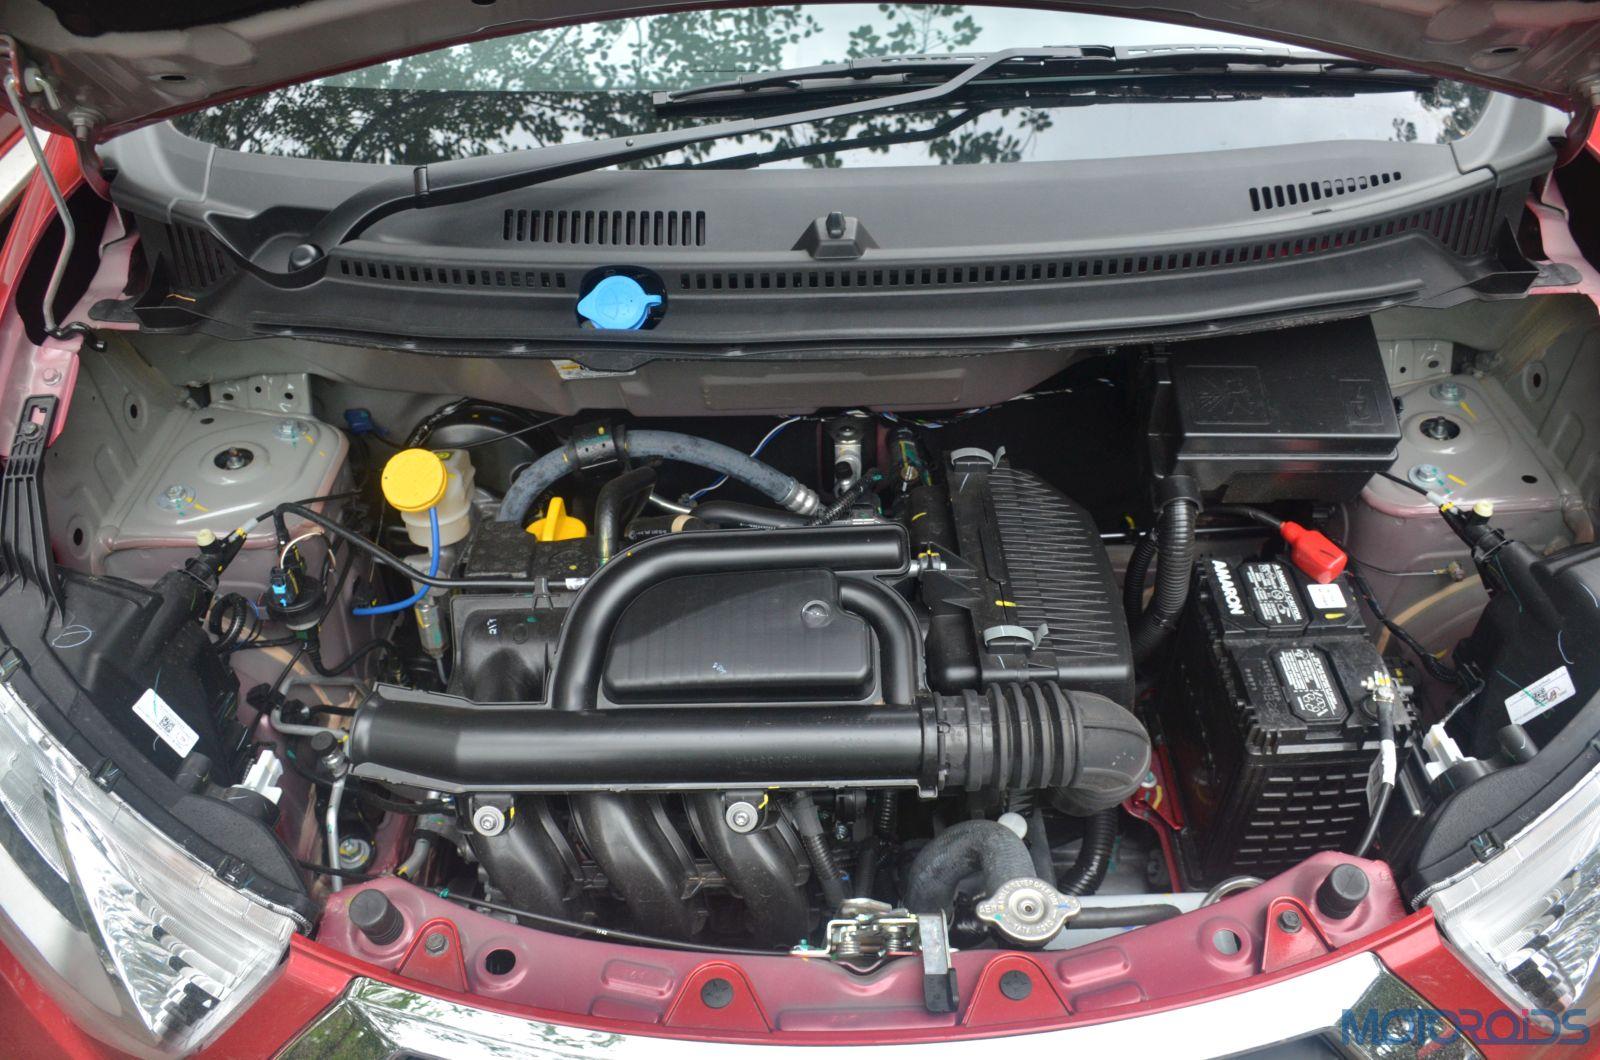 July 13, 2017-New-Datsun-redi-GO-1.0-Review-33.jpg